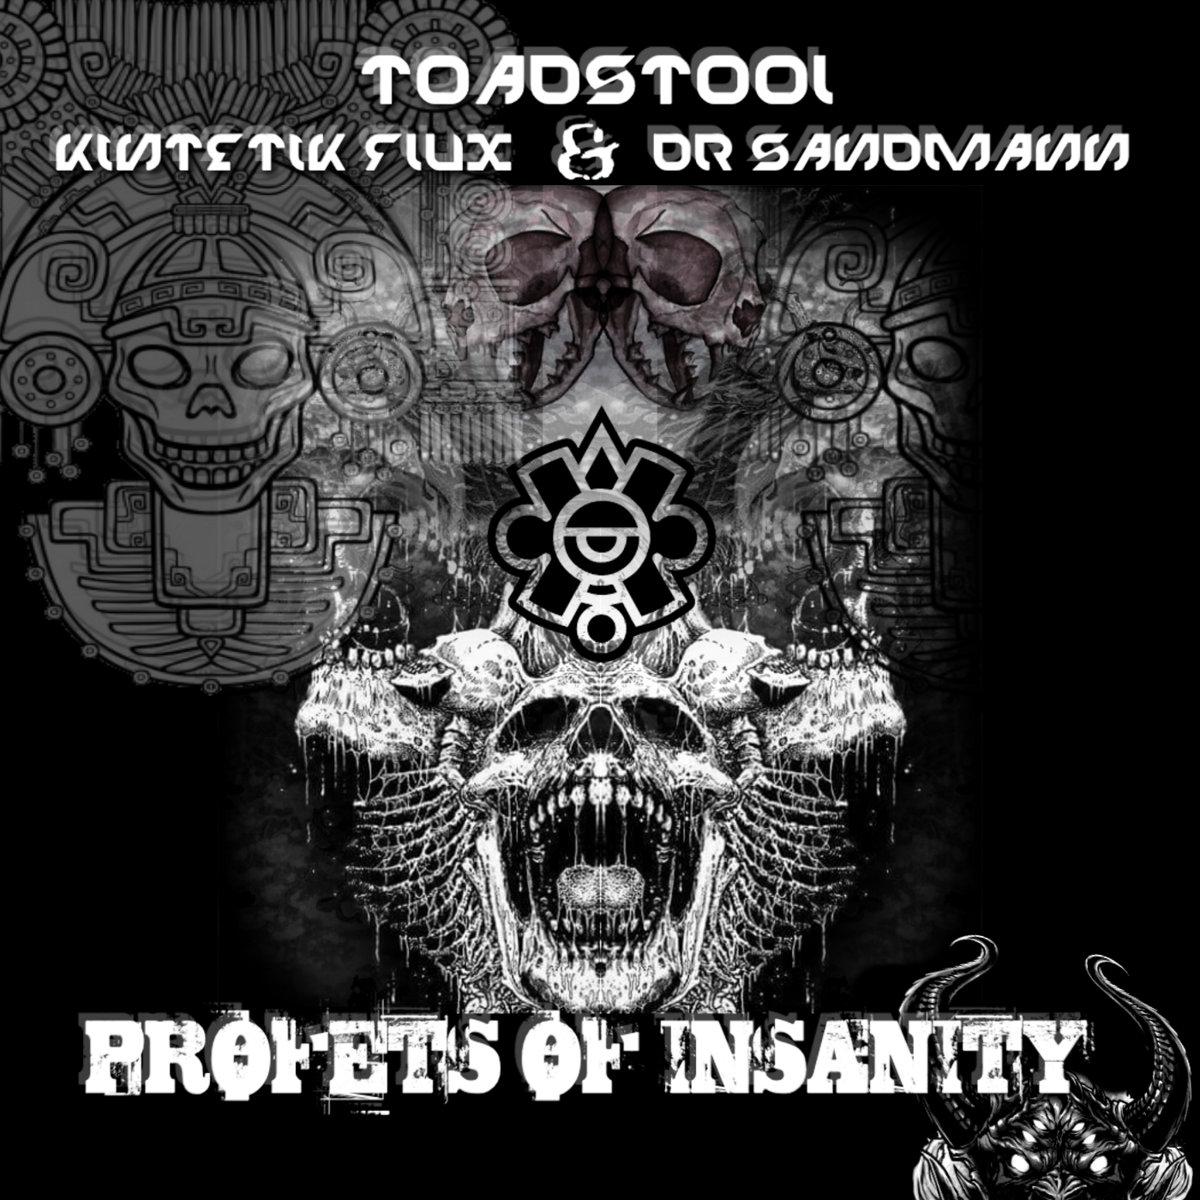 Kinetik Flux Toadstool Der Sandmann Profets Of Insanity Ep Free Download Toadstool Kinetik Flux Der Sandmann Toadstool